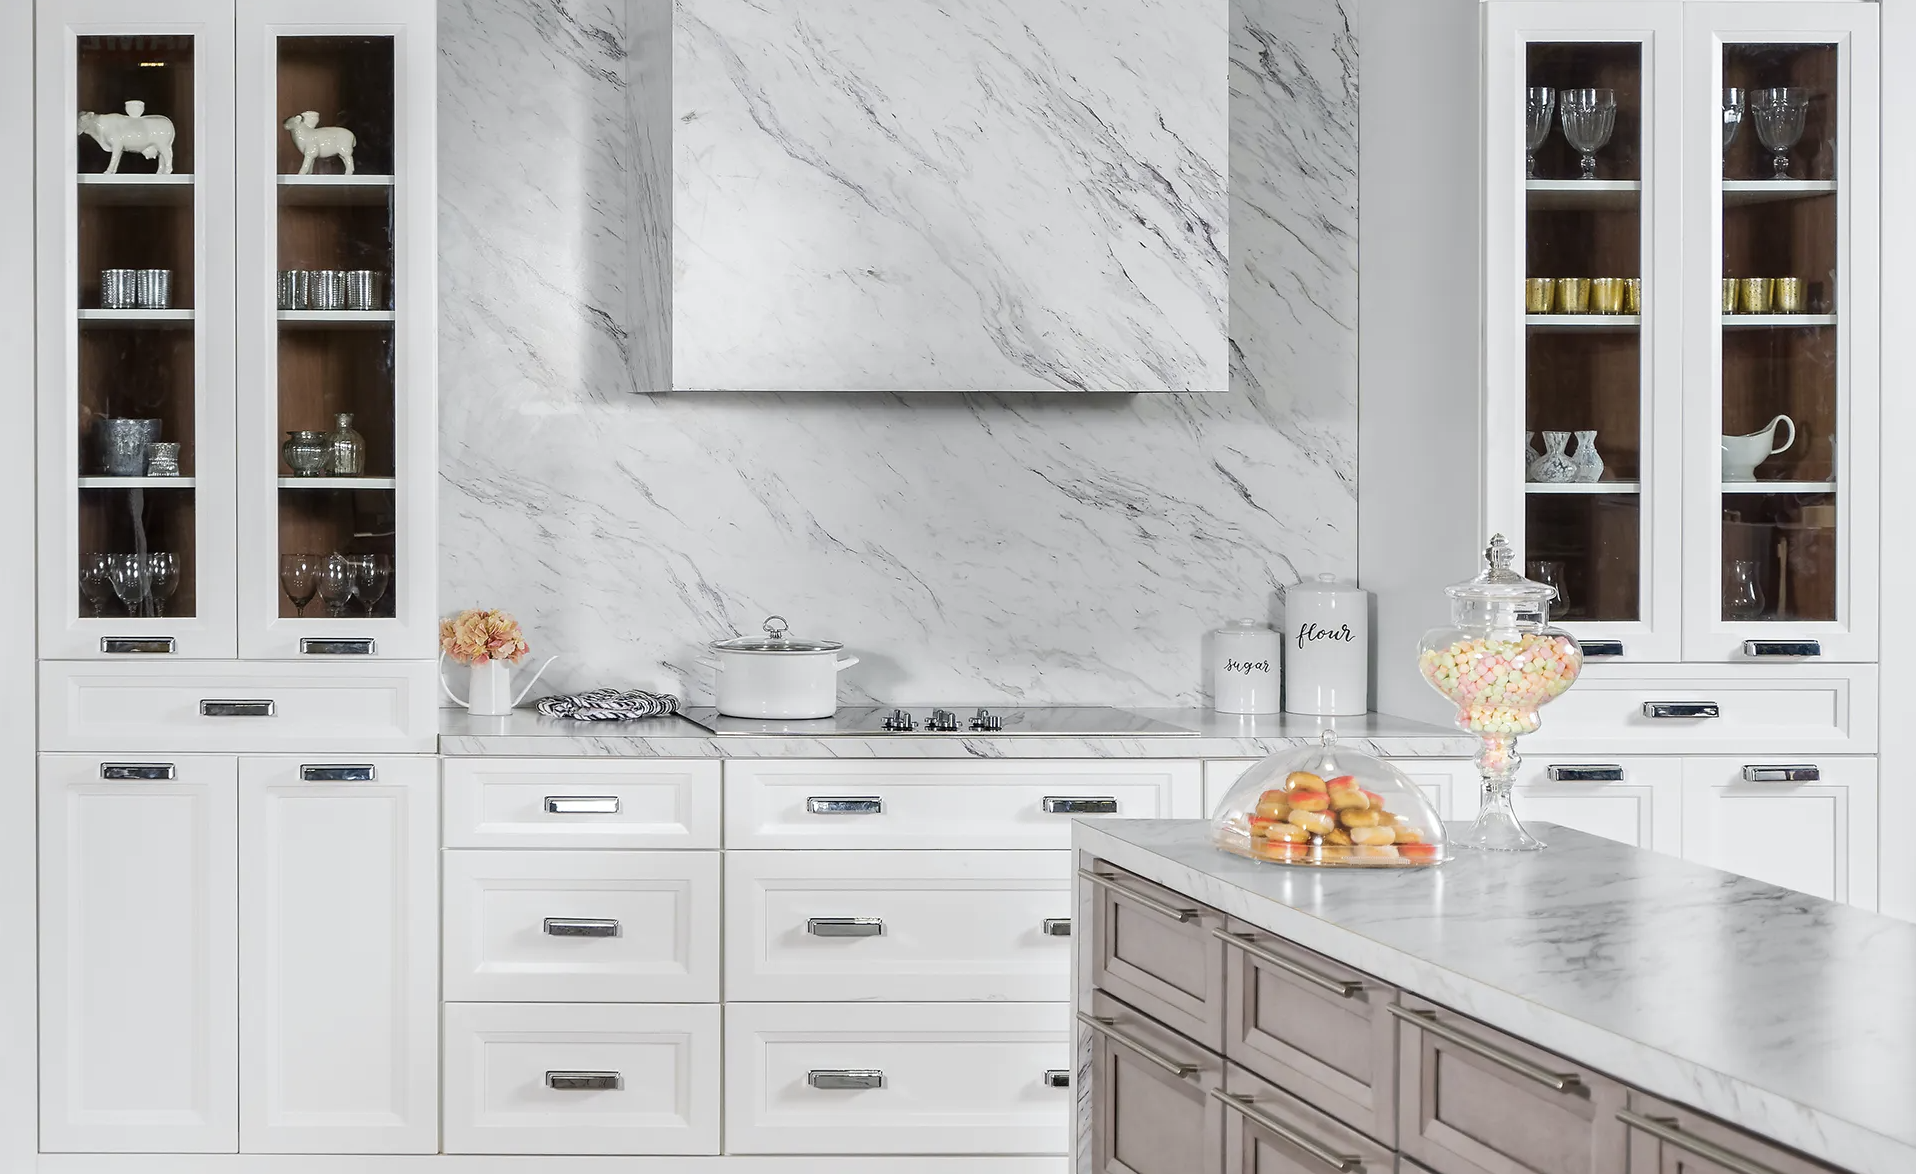 Fabuwood Cabinetry for kitchen redesign, Johnson Lumber, Maryland Kitchen Design